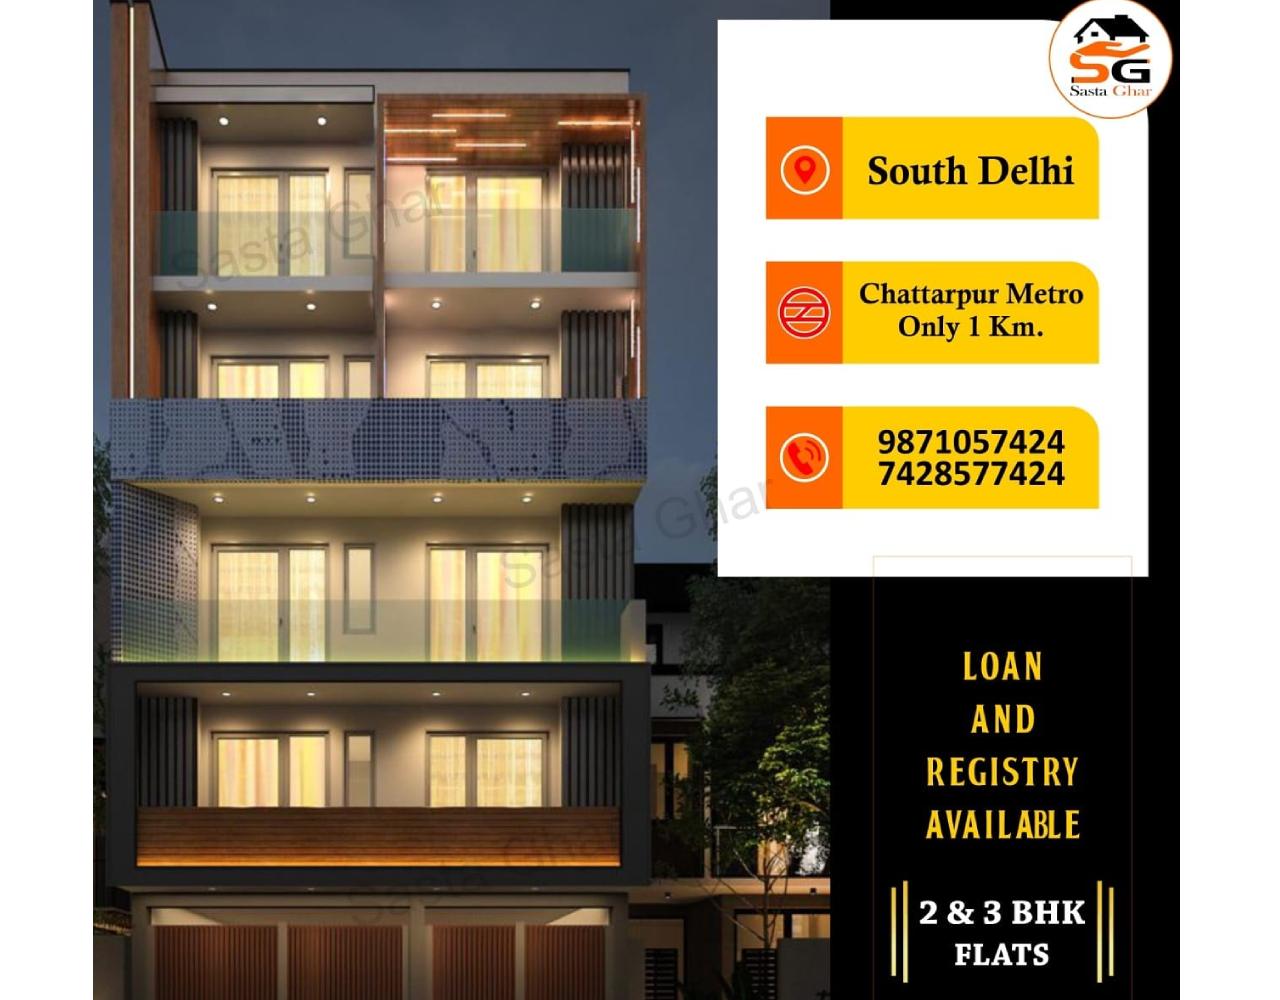 3 BHK flats Chattarpur Extension